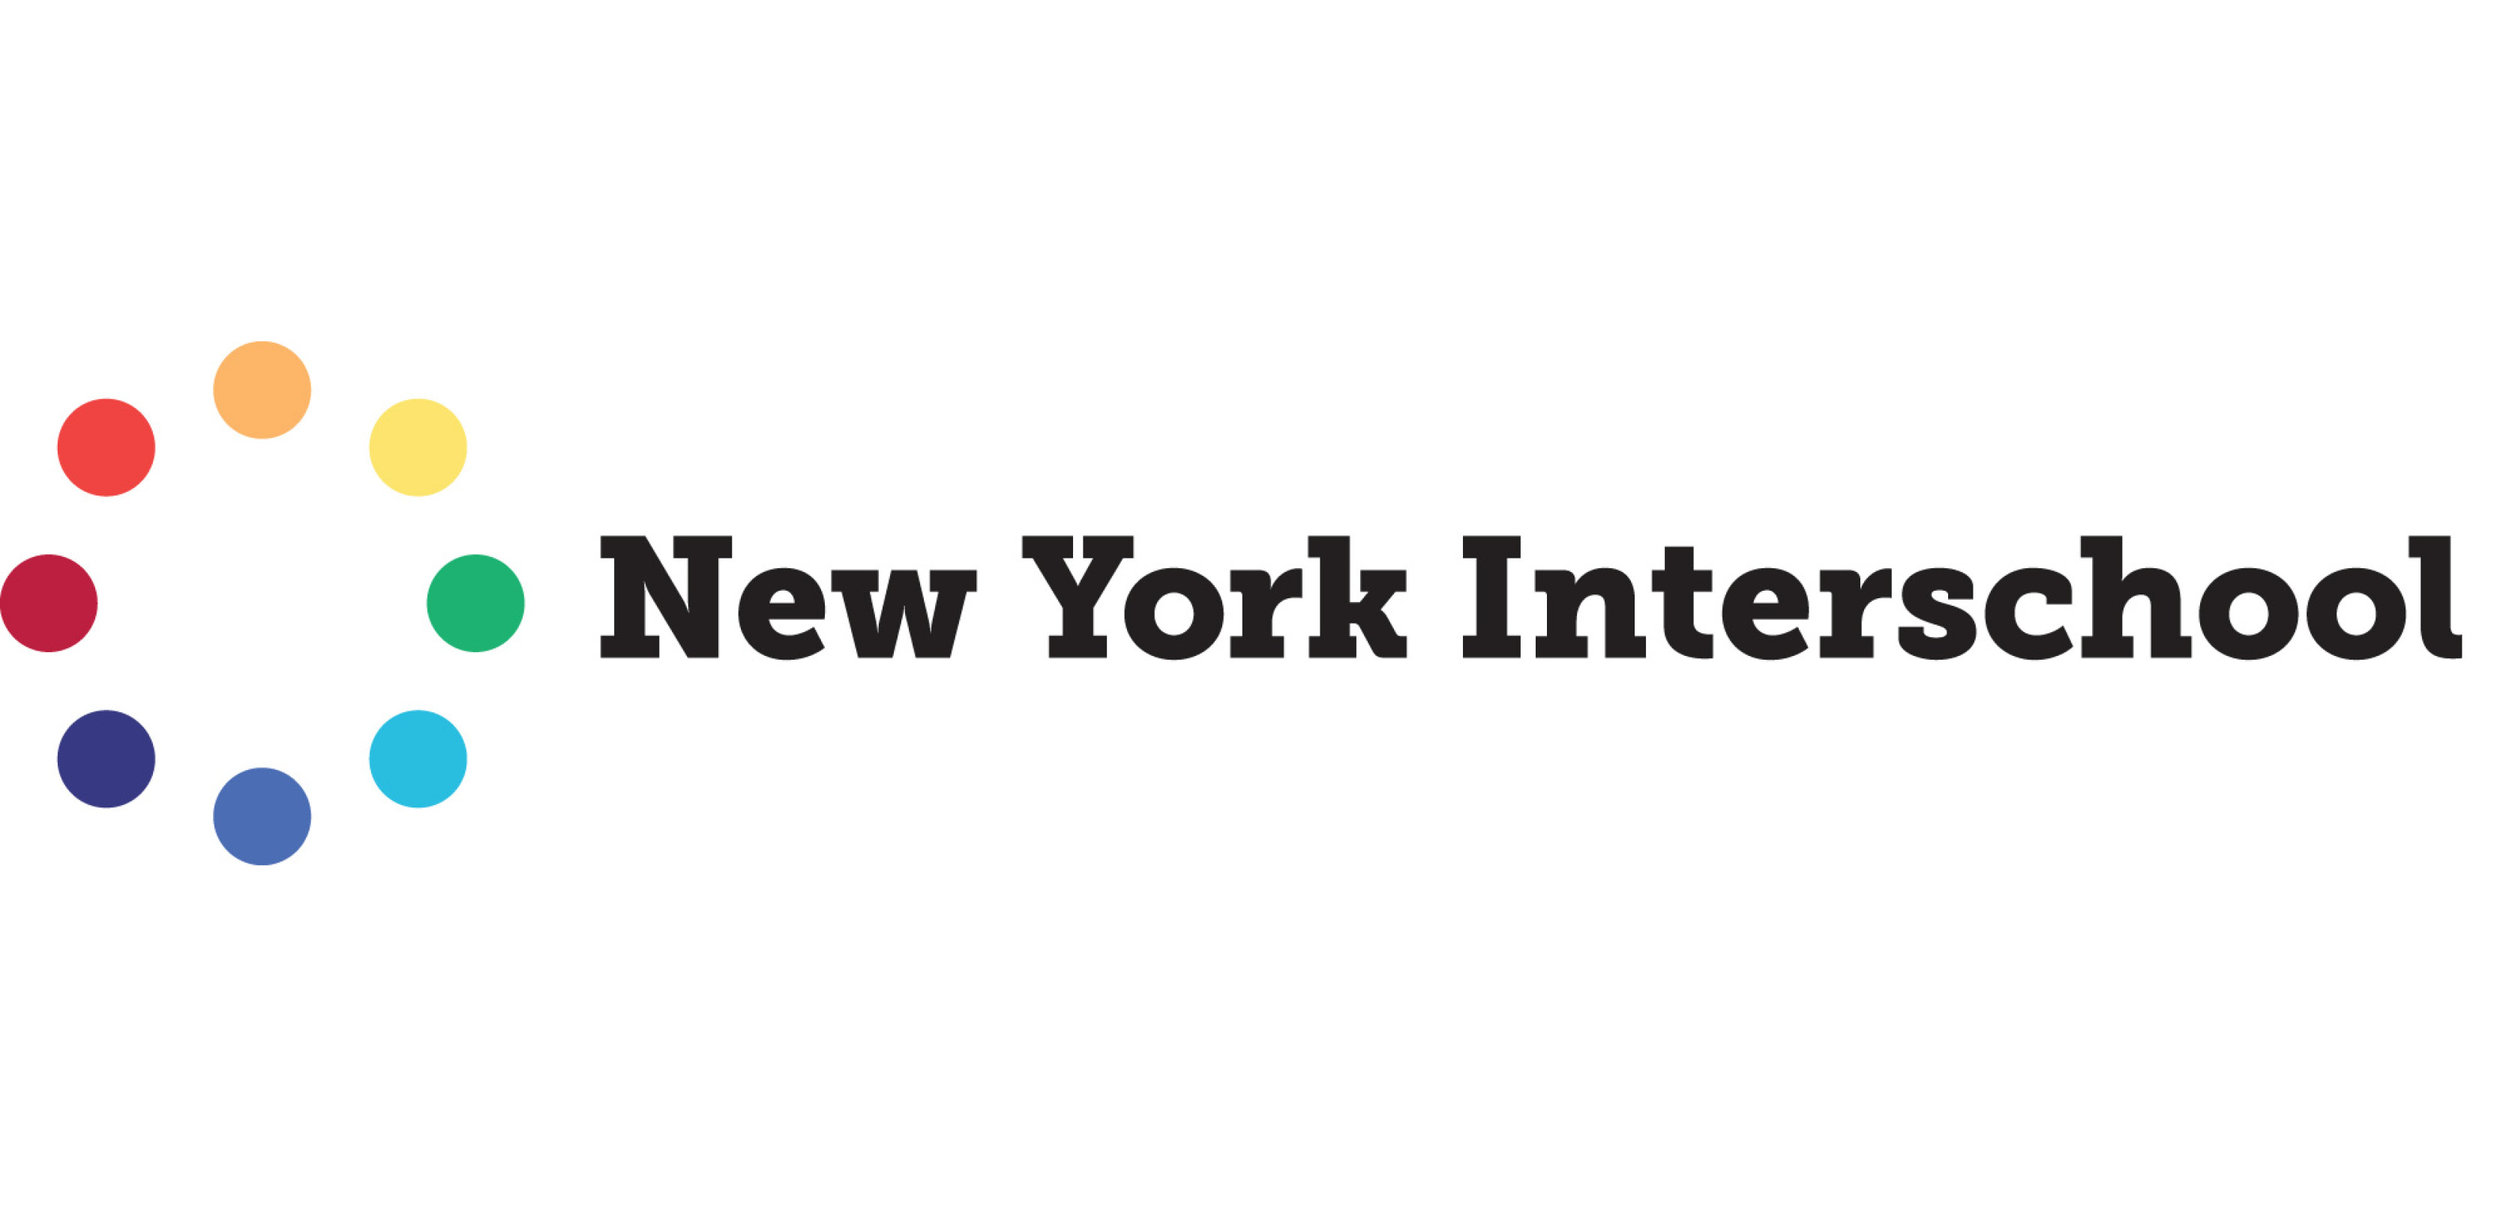 New York Interschool